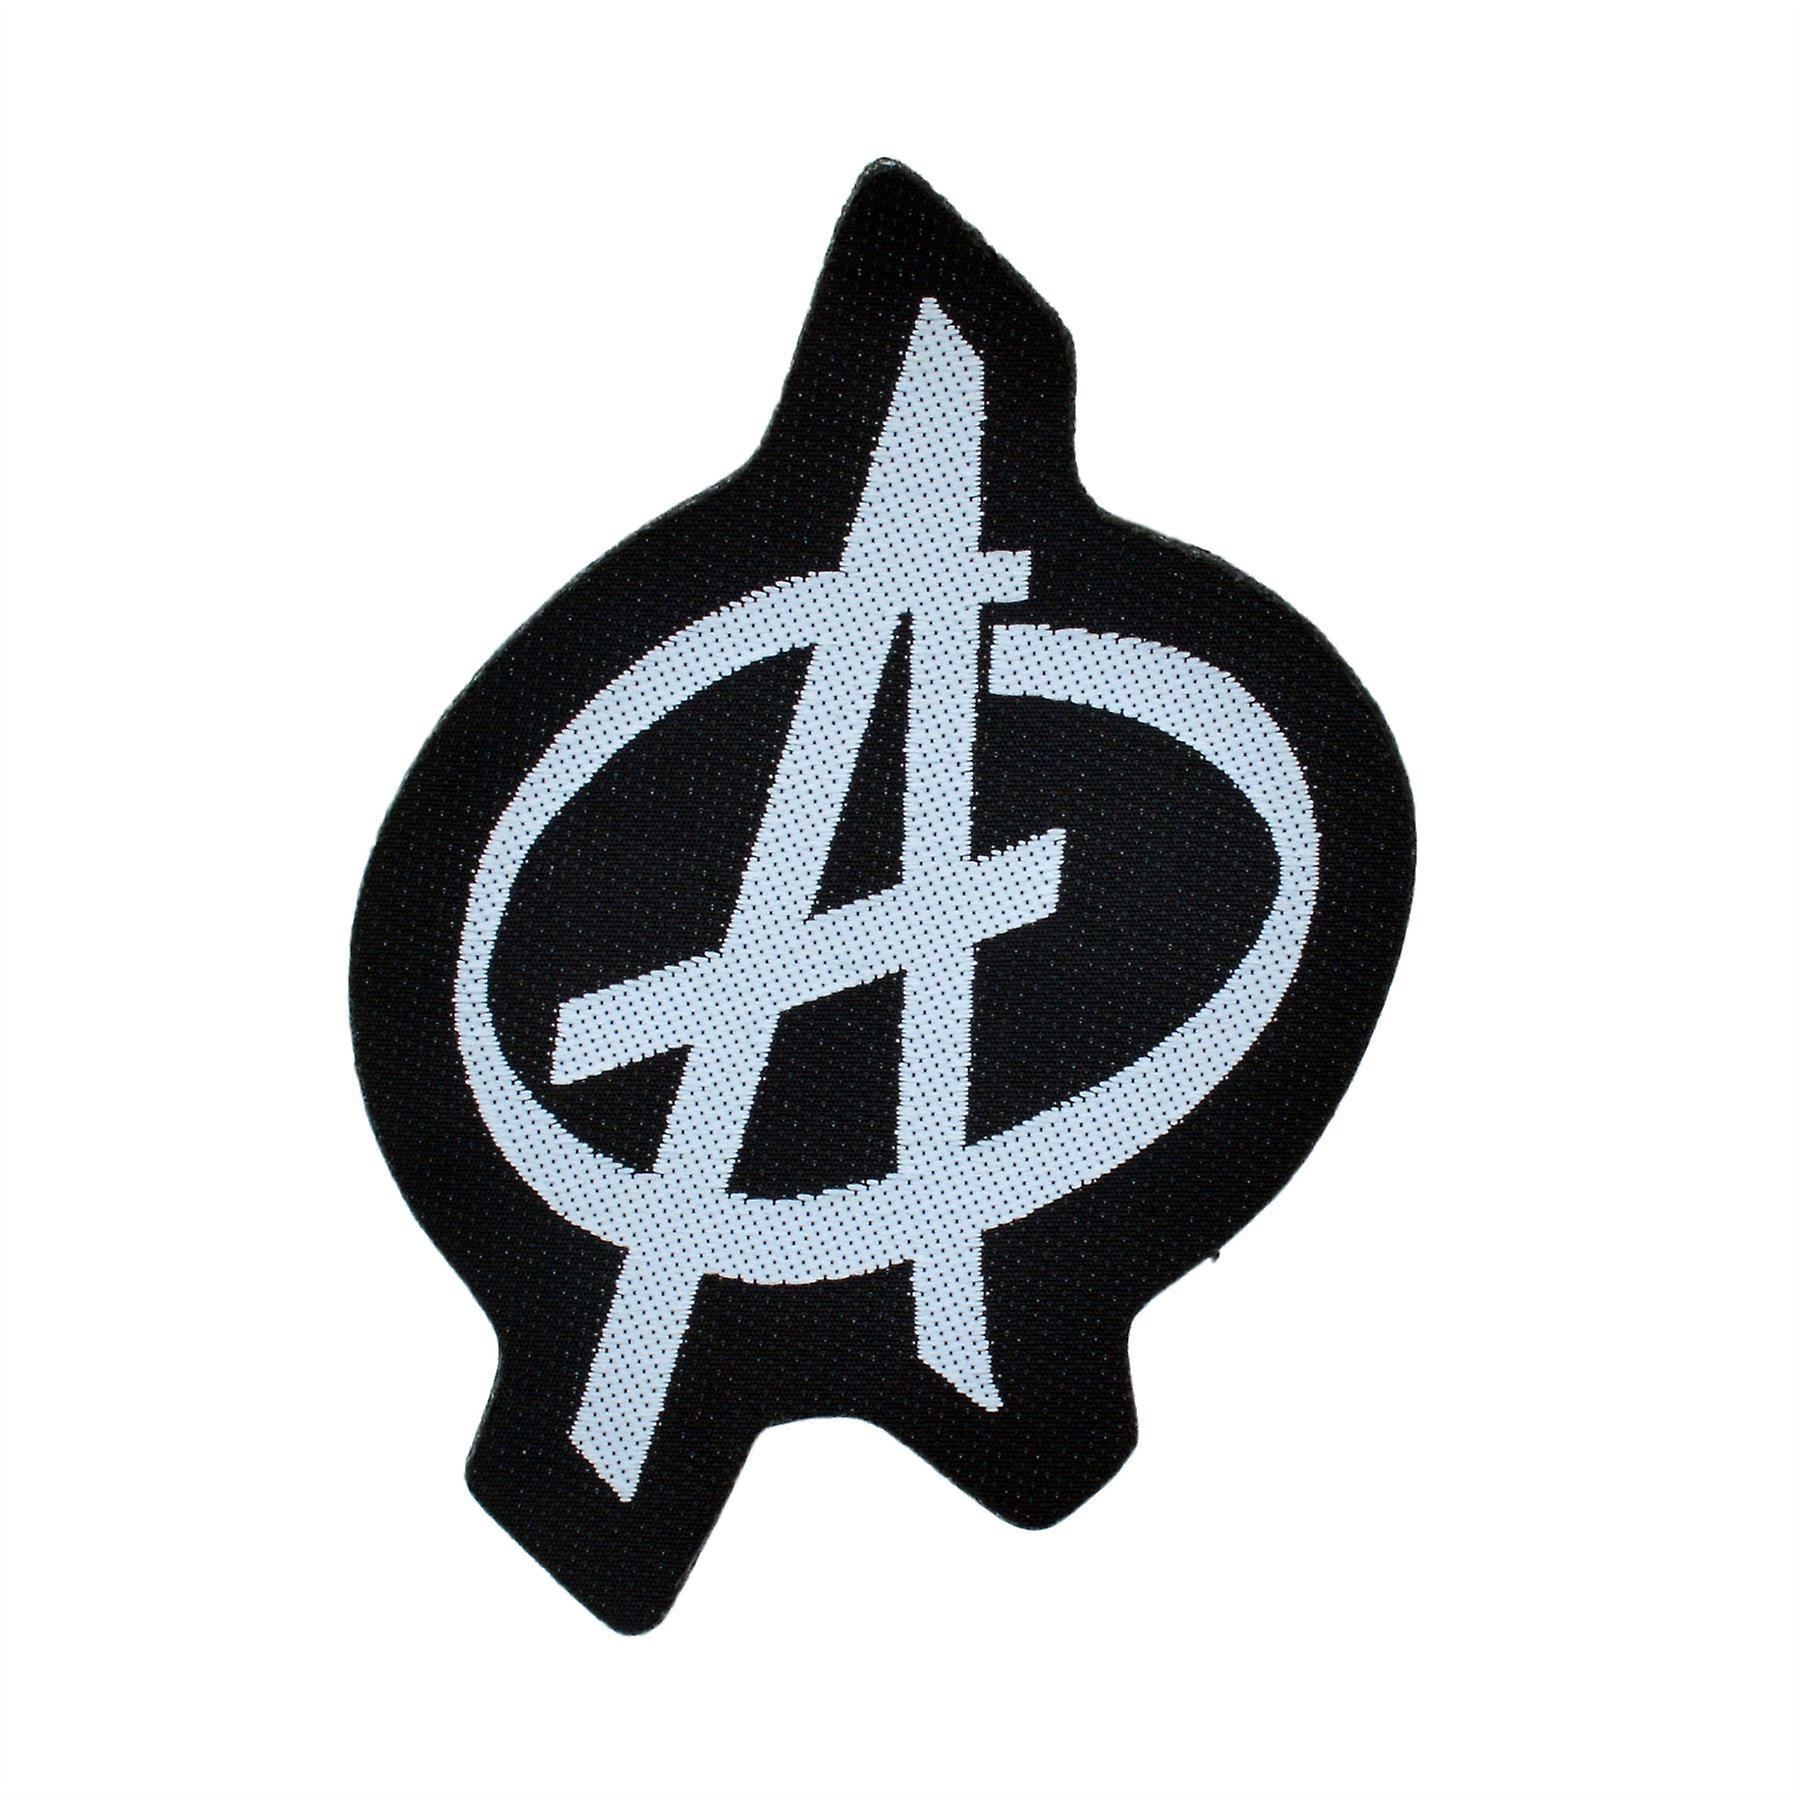 Anarchy Symbol Woven Patch Fruugo